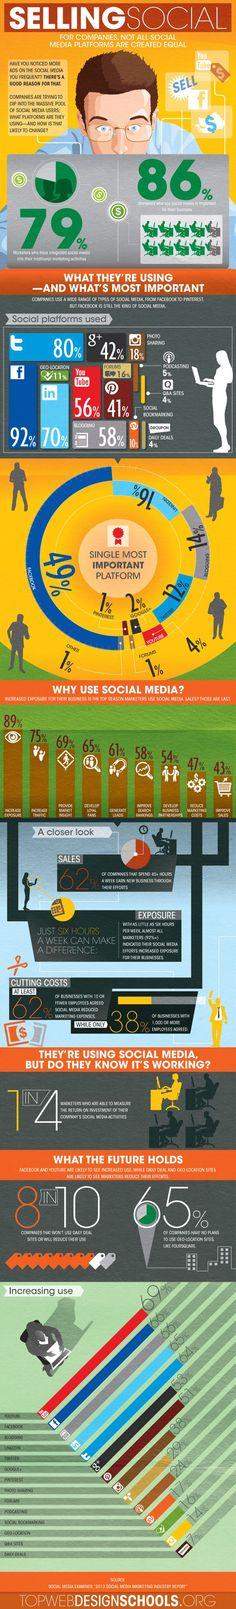 Selling on Social Media [INFOGRAPHIC] #socialmedia #infographic